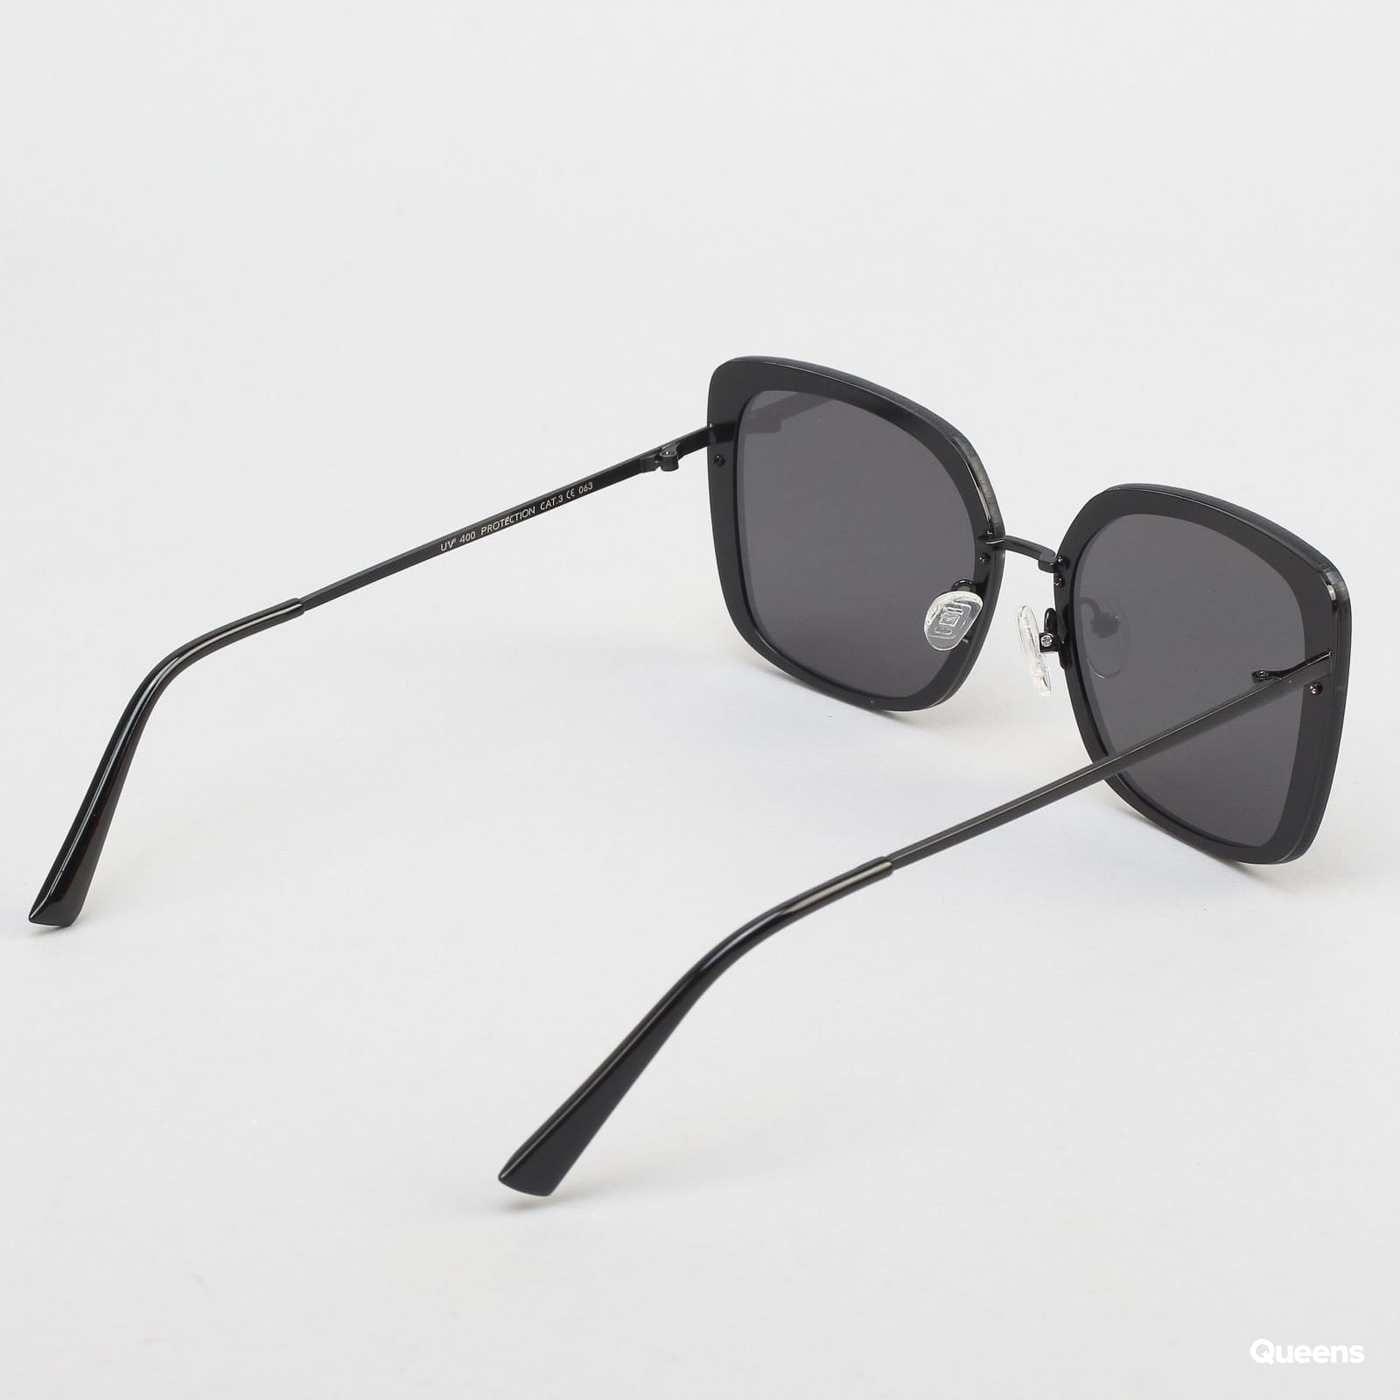 MD Sunglasses December schwarz